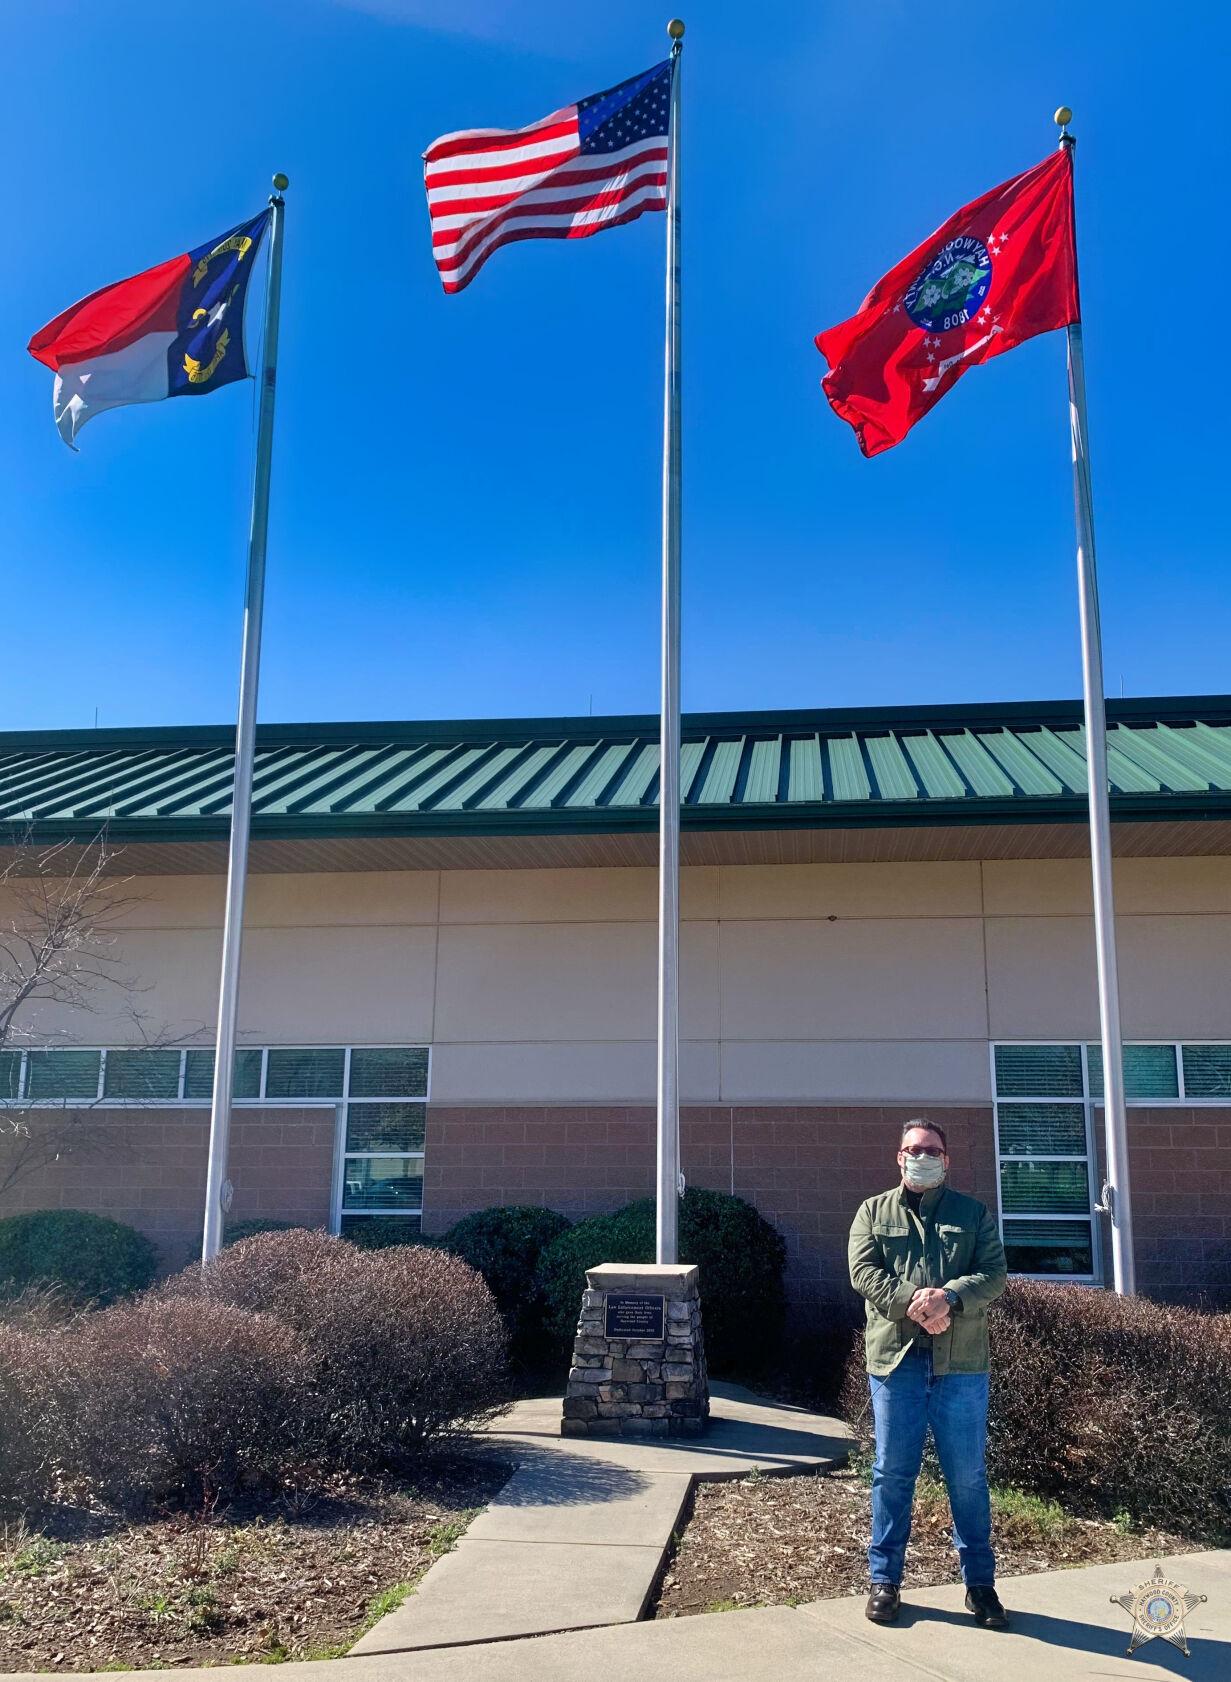 Haywood County detention center